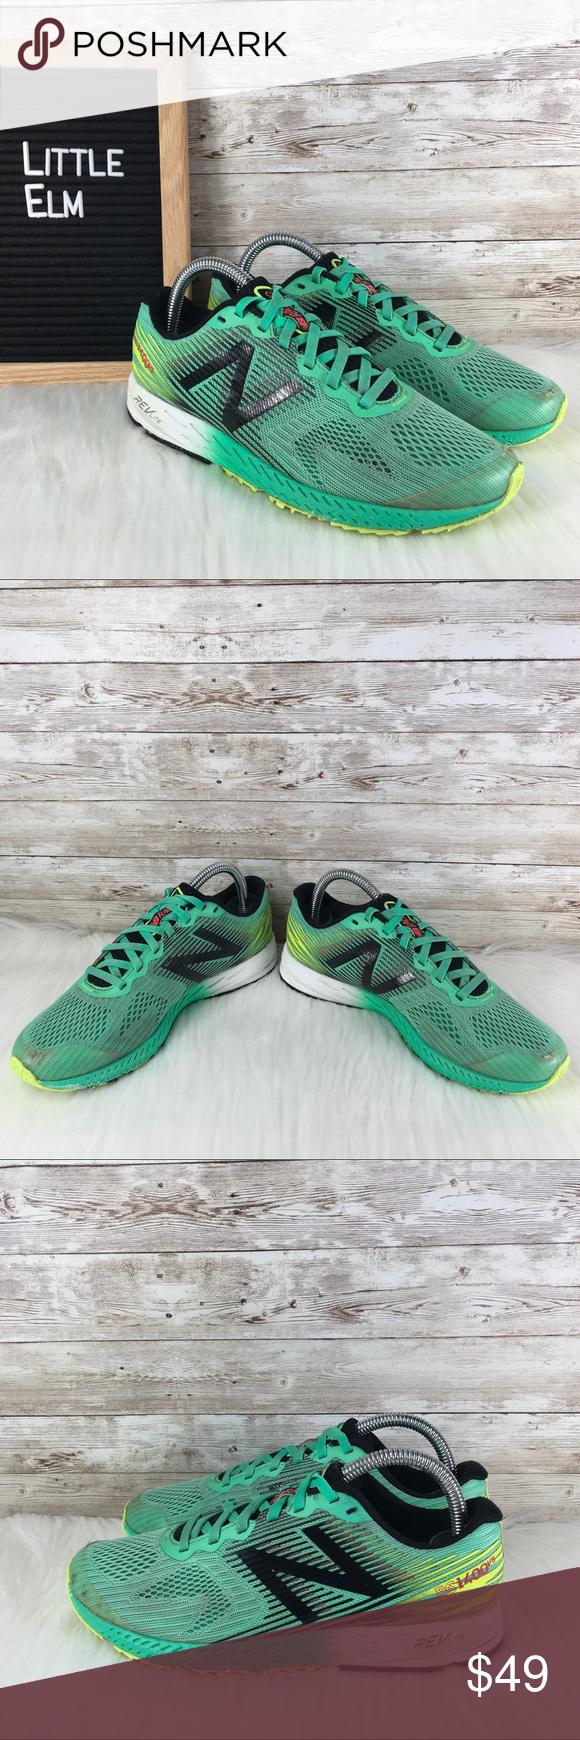 New Balance 1400 V5 Running Shoe Women's | Womens running shoes ...